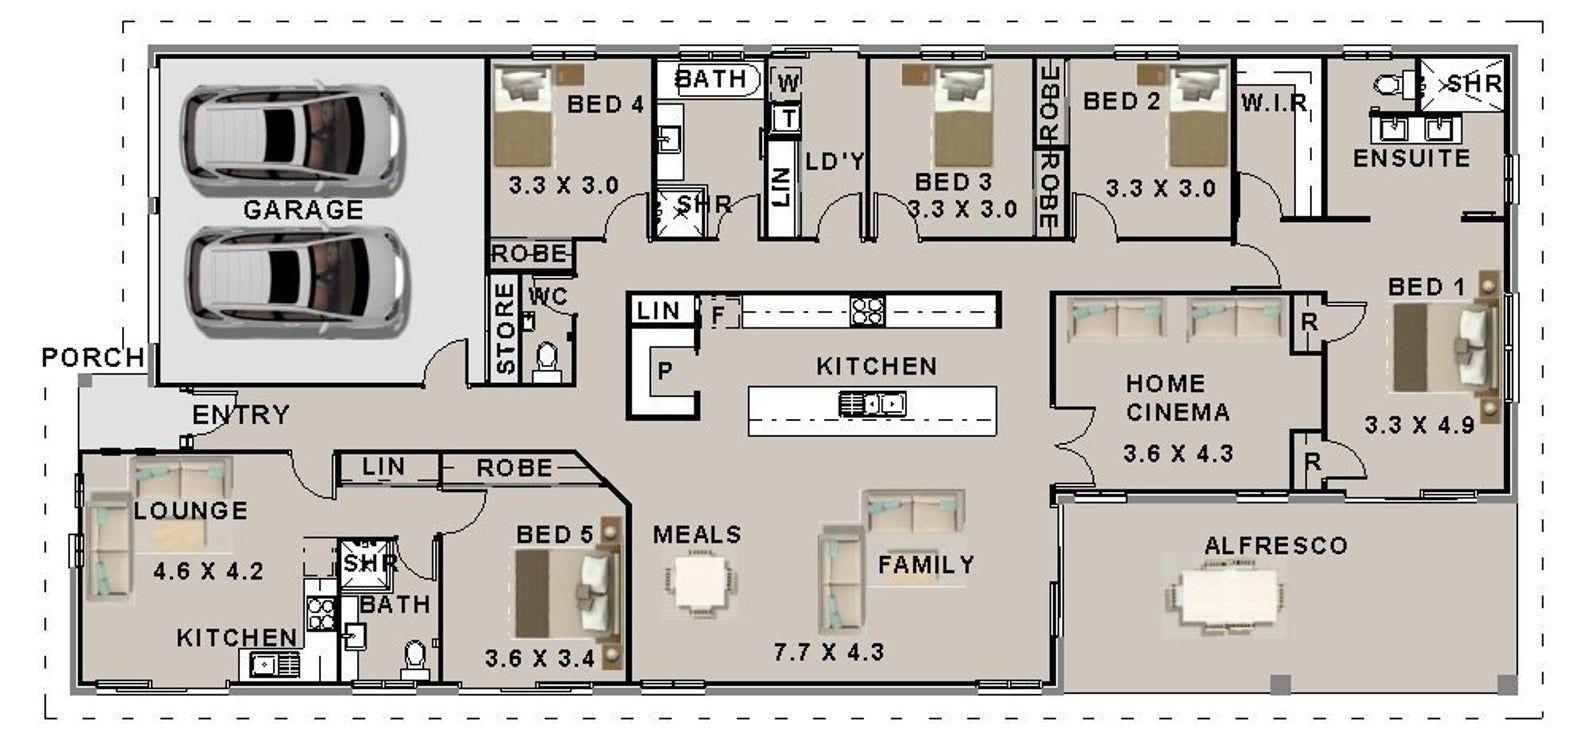 304 M2 5 Bedrooms Home Cinema Plan 5 Bed 5 Bed Home Etsy Bedroom Floor Plans Australian House Plans Multigenerational House Plans